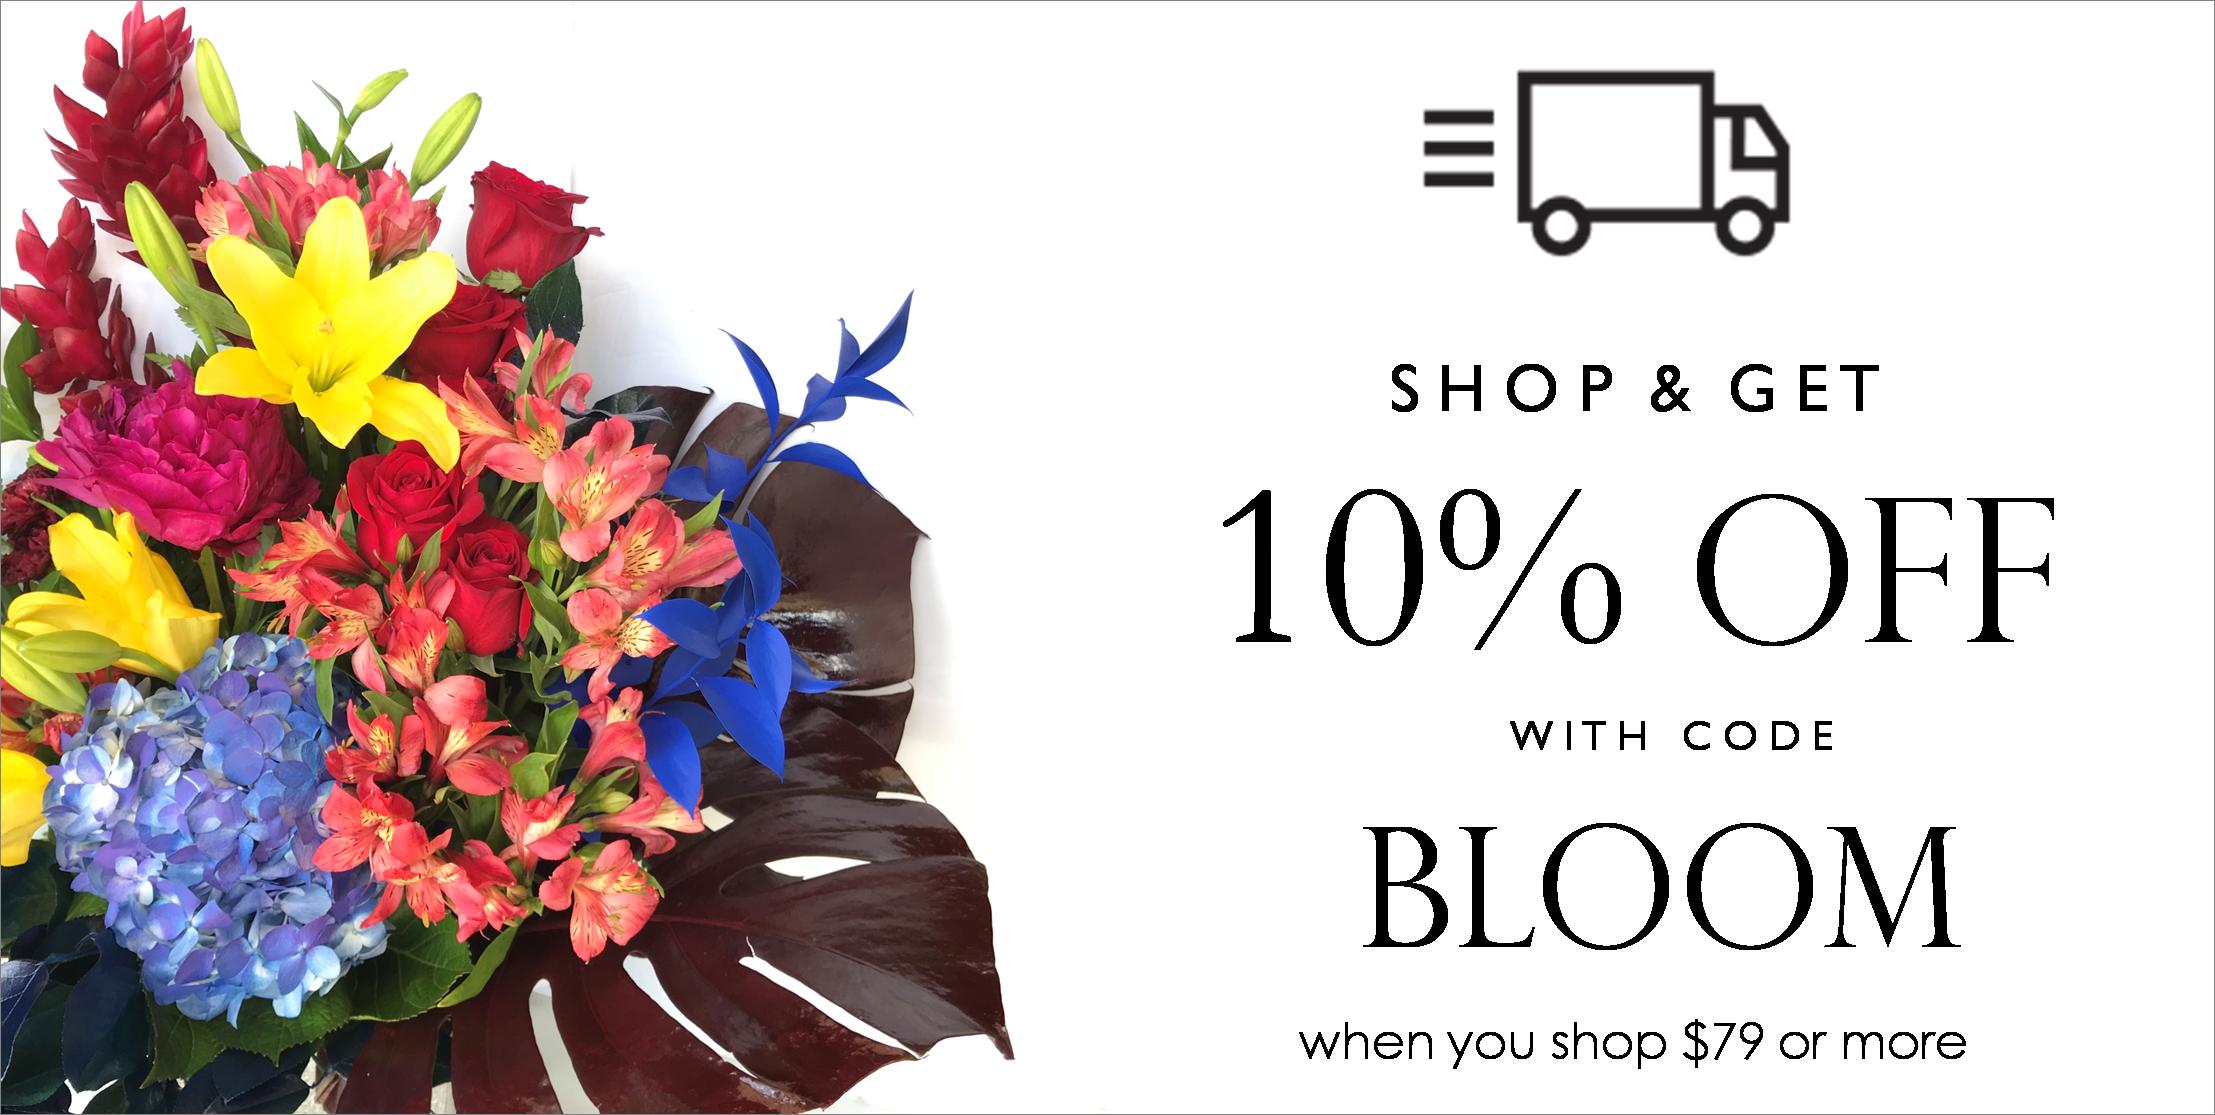 1we-make-el-paso-bloom-with-luxury-gift-rose-boxes-angies-floral-designs-angies-we-make-el-paso-el-paso-florist-birthdays-bloom-floral-instagram-delivery-rose-delivery-el-paso-florist-angies-flower.png